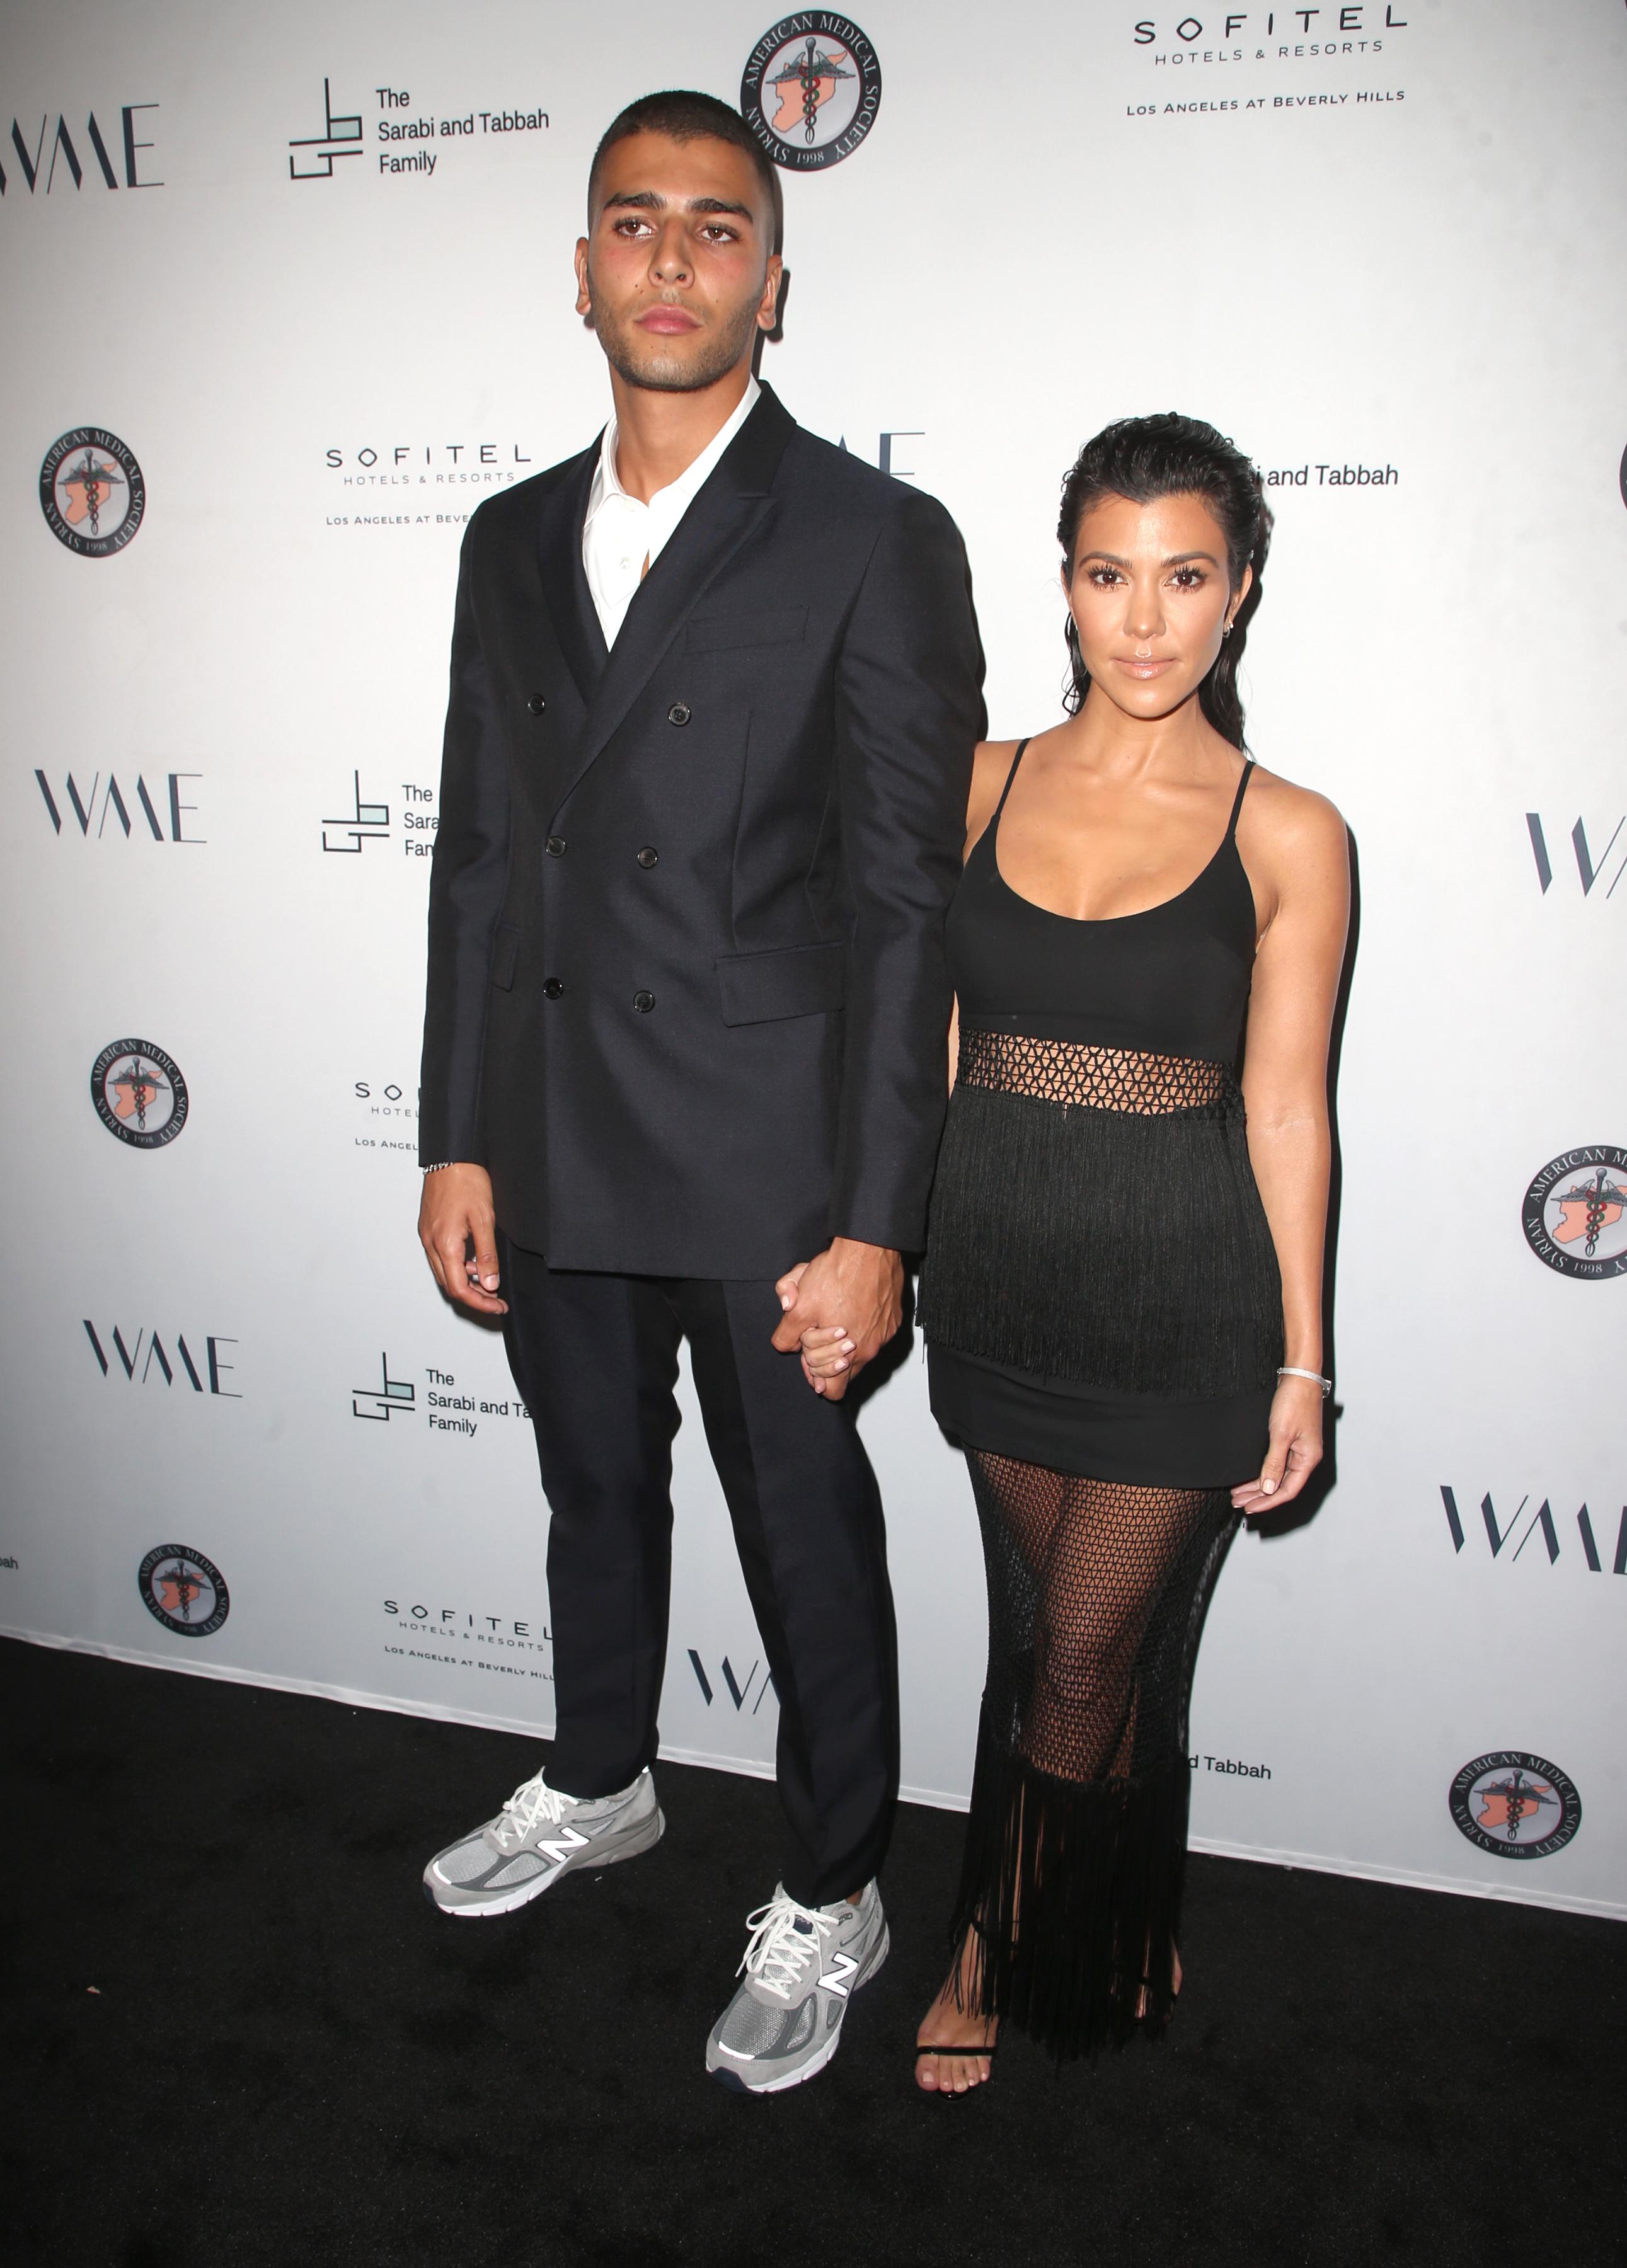 Kourtney Kardashian dating fransk Montana plushie dating